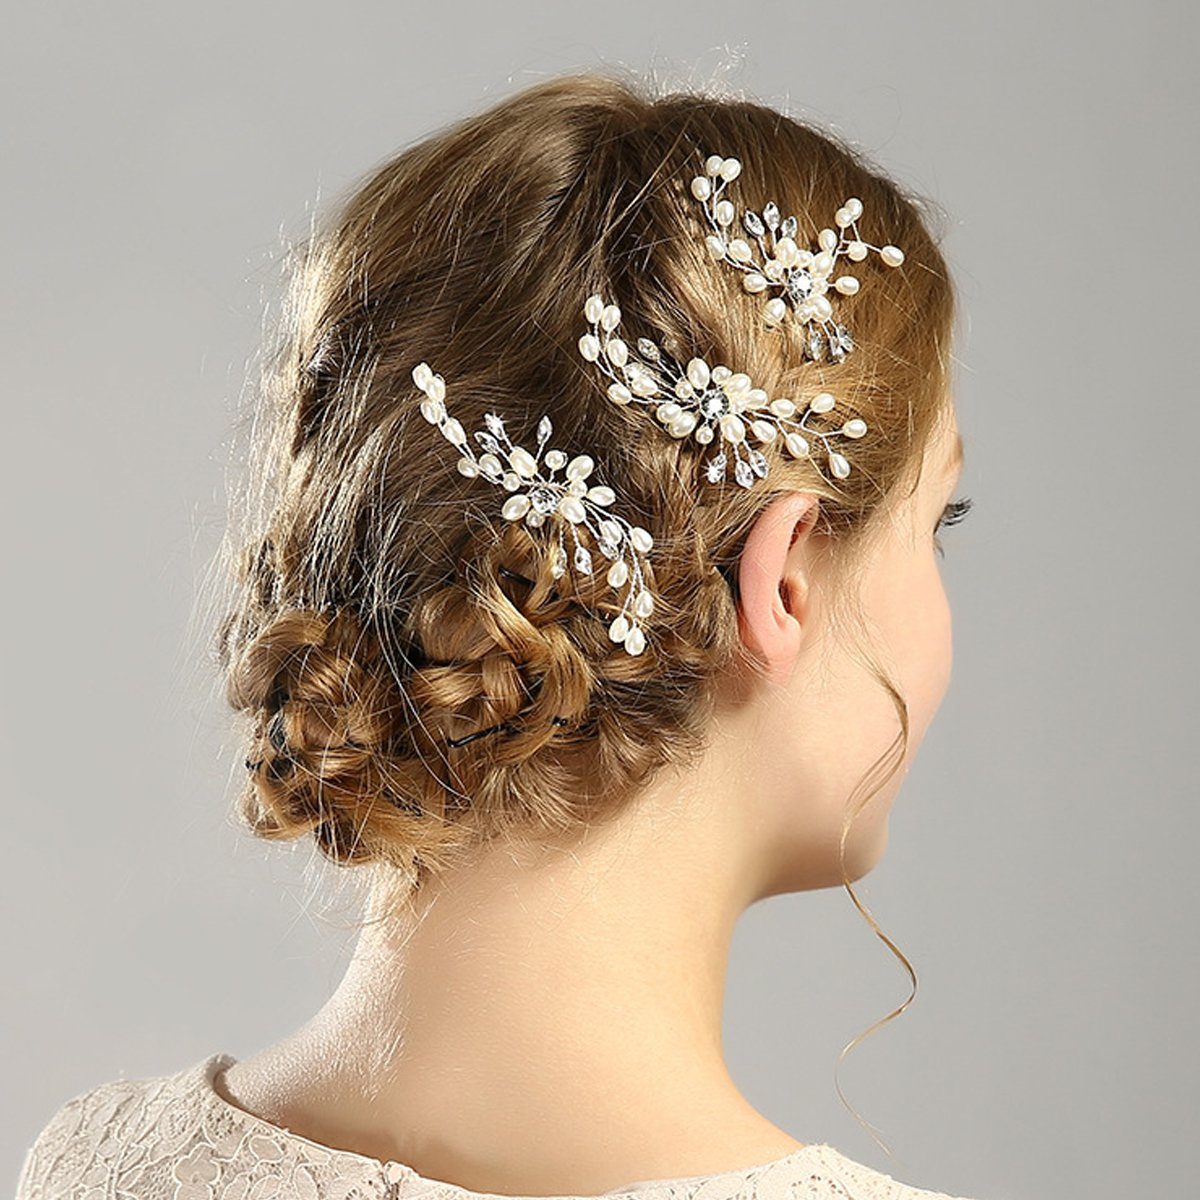 Ouinne 3pcs Horquillas de Perlas y Diamantes de Imitación Elegantes para Novia Accesorios de pelo Pinza para Cabellopara Bodas Fiestas